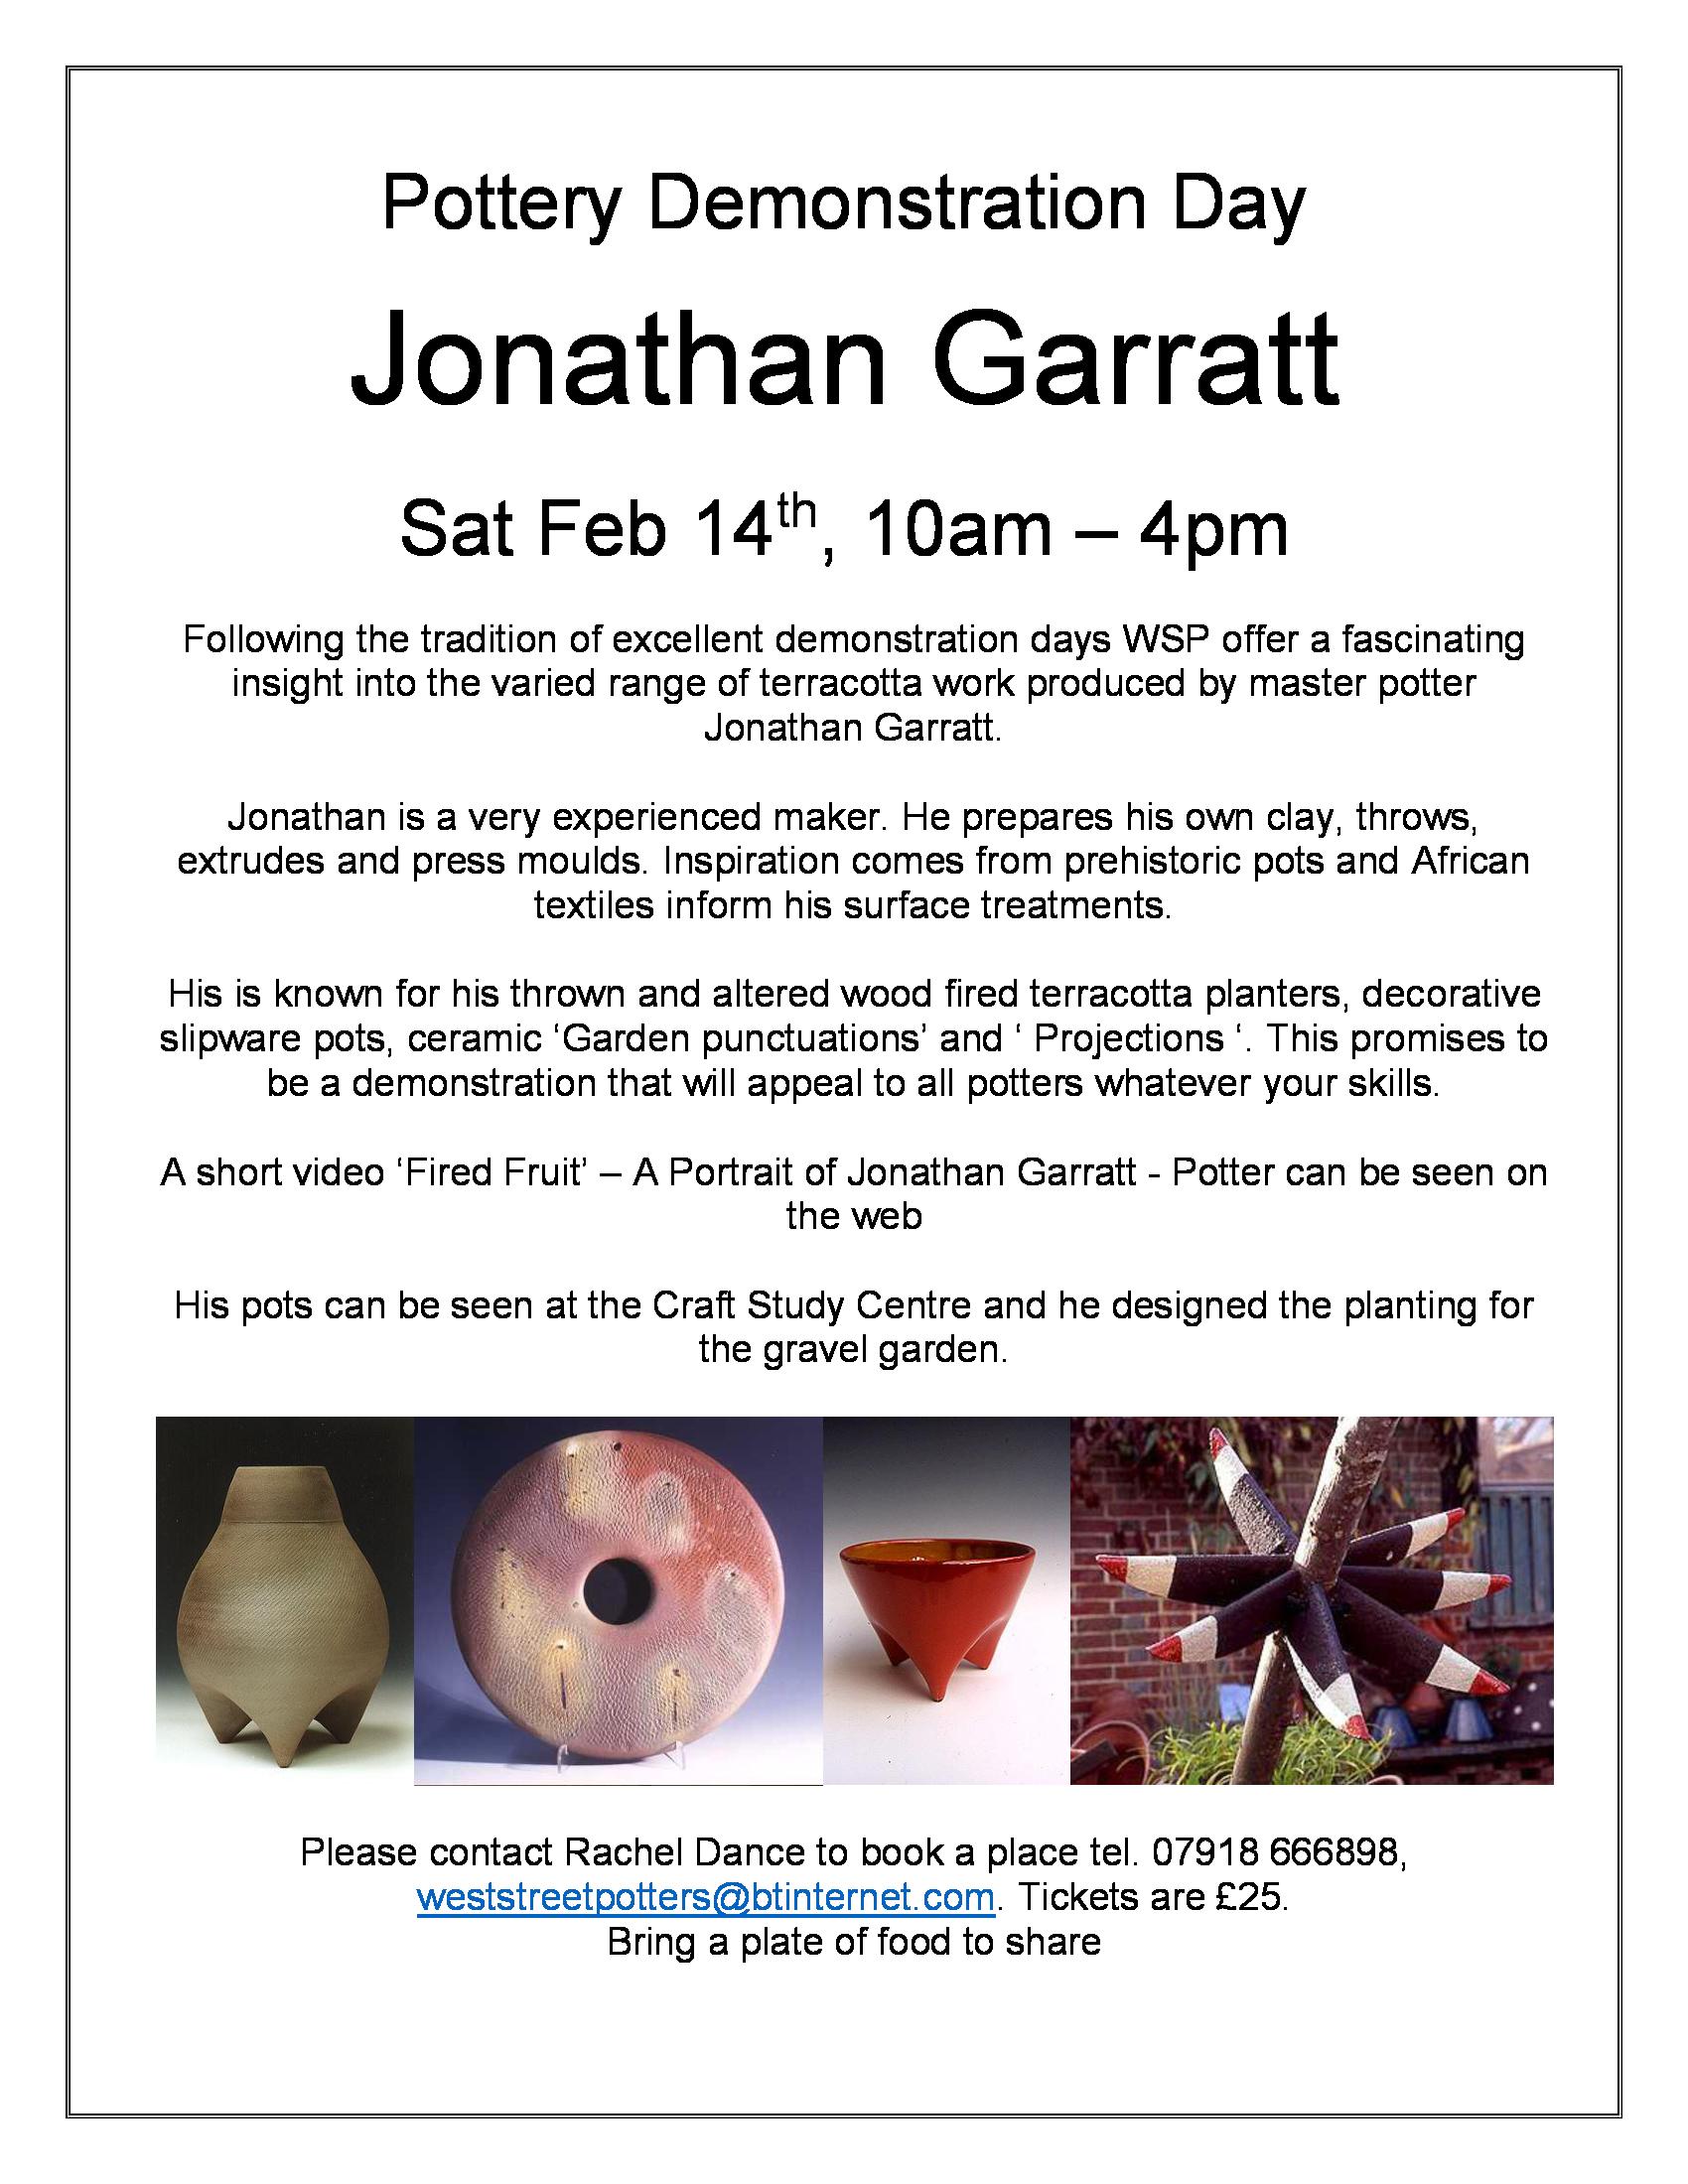 Jonathan Garratt – 14th Feb 2015